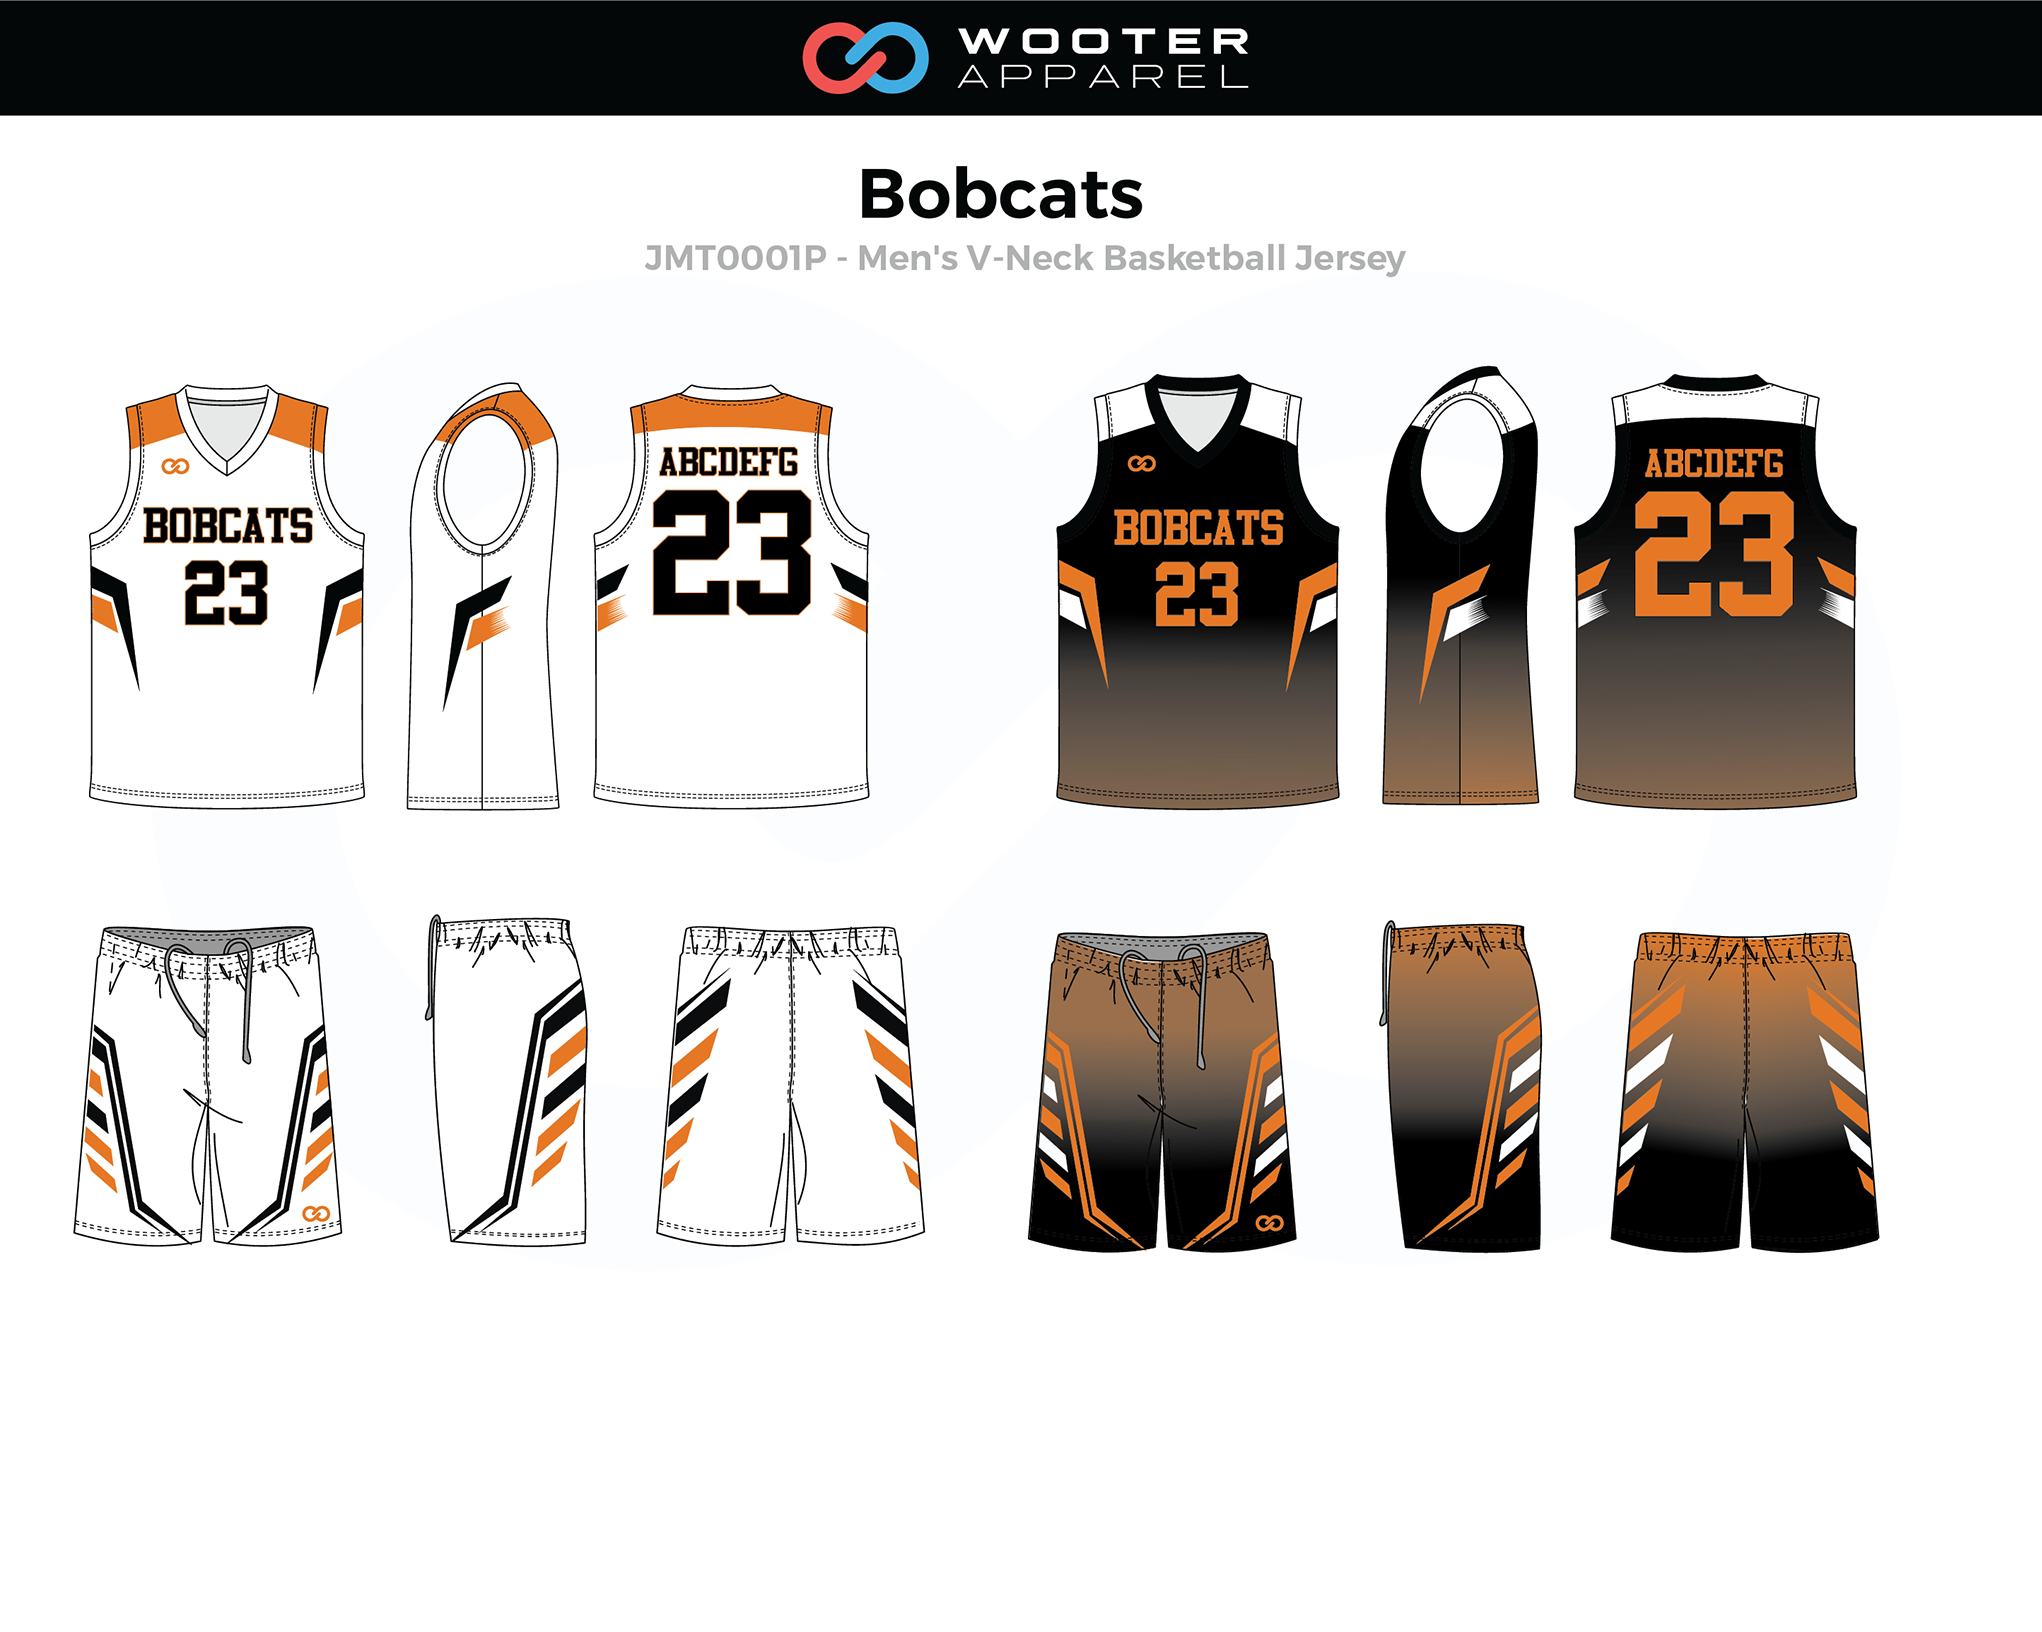 BOBCATS White Black Orange Men's V-Neck Basketball Uniform, Jersey and Shorts